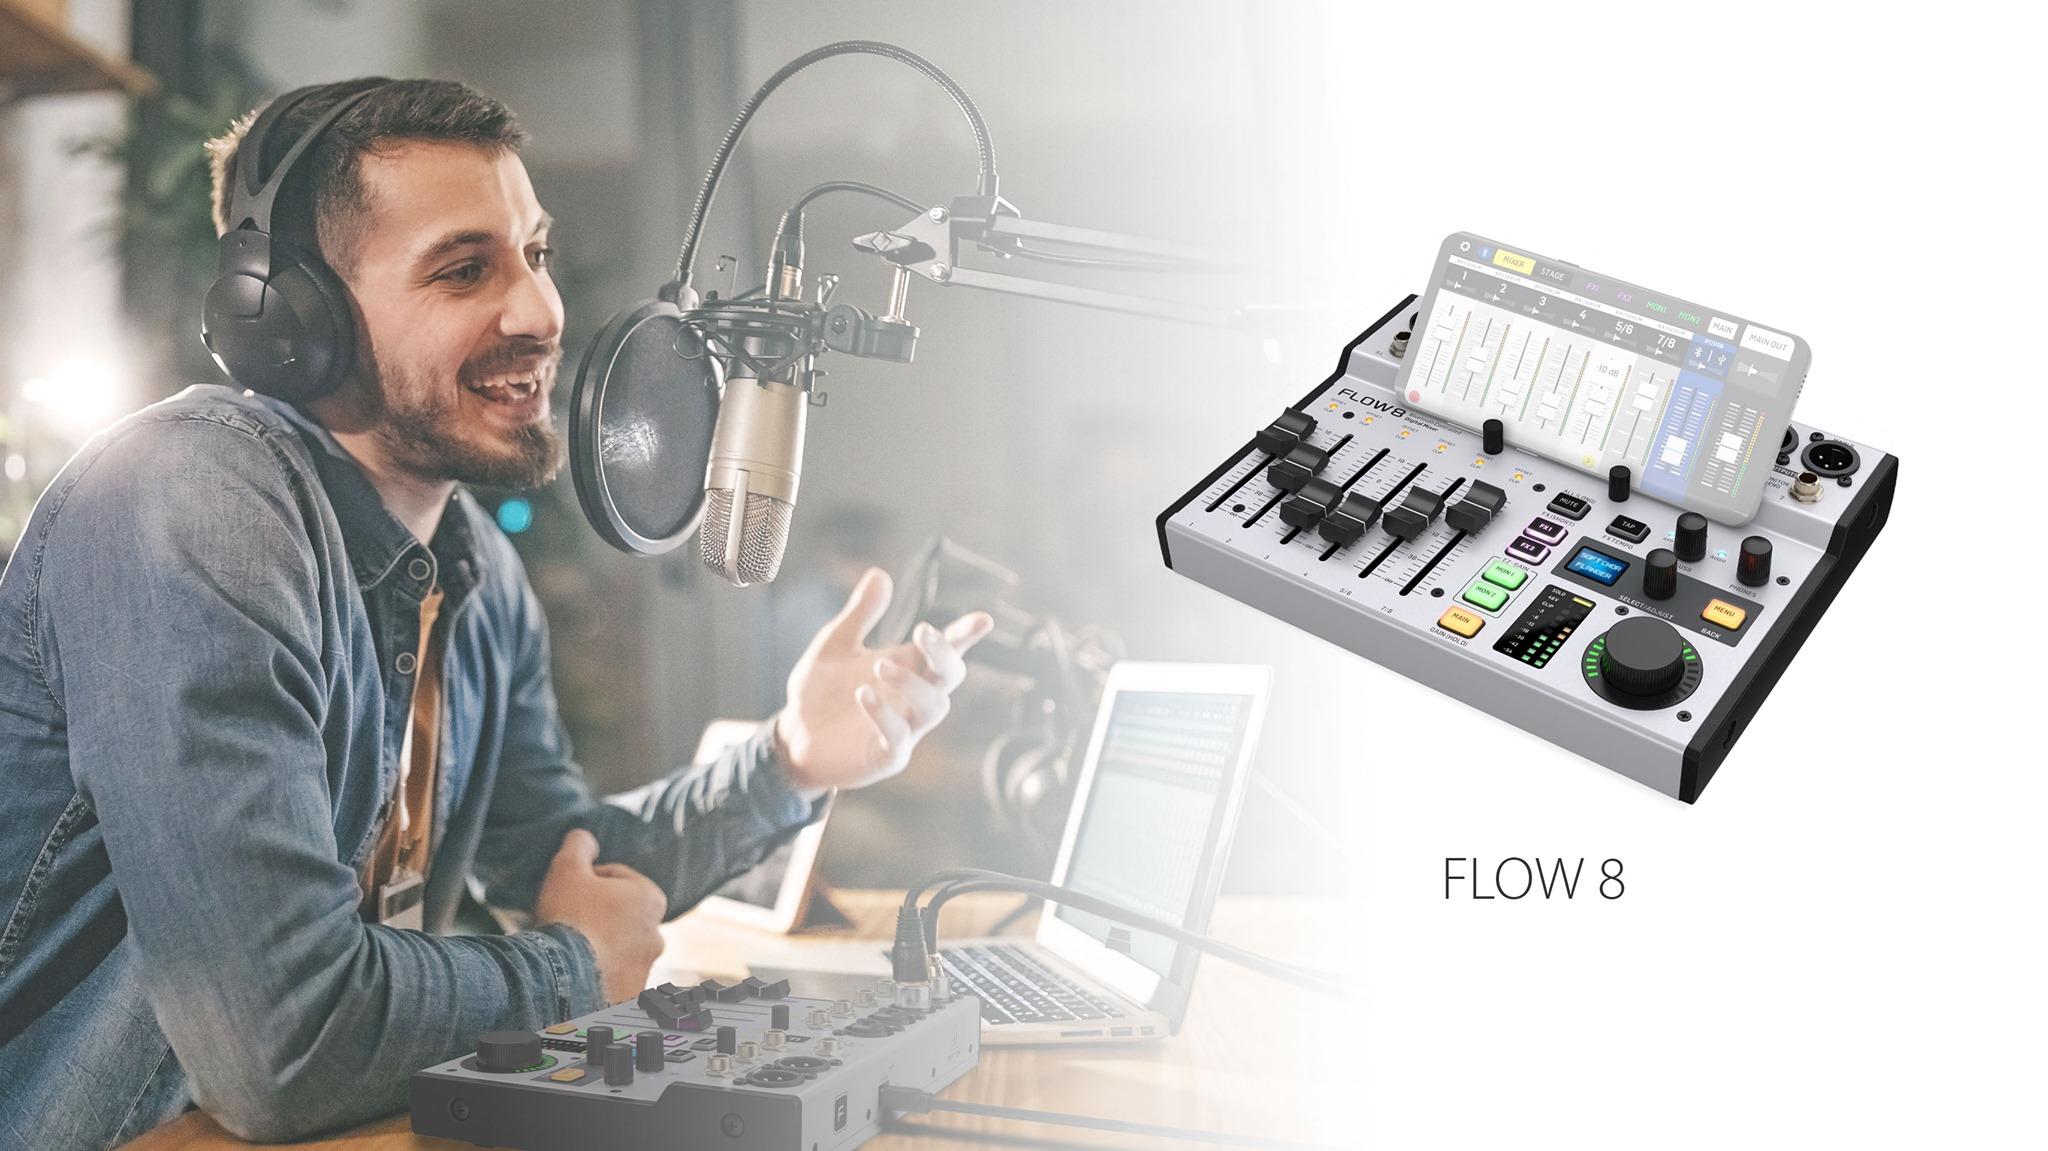 Behringer Flow8 Digitalpult